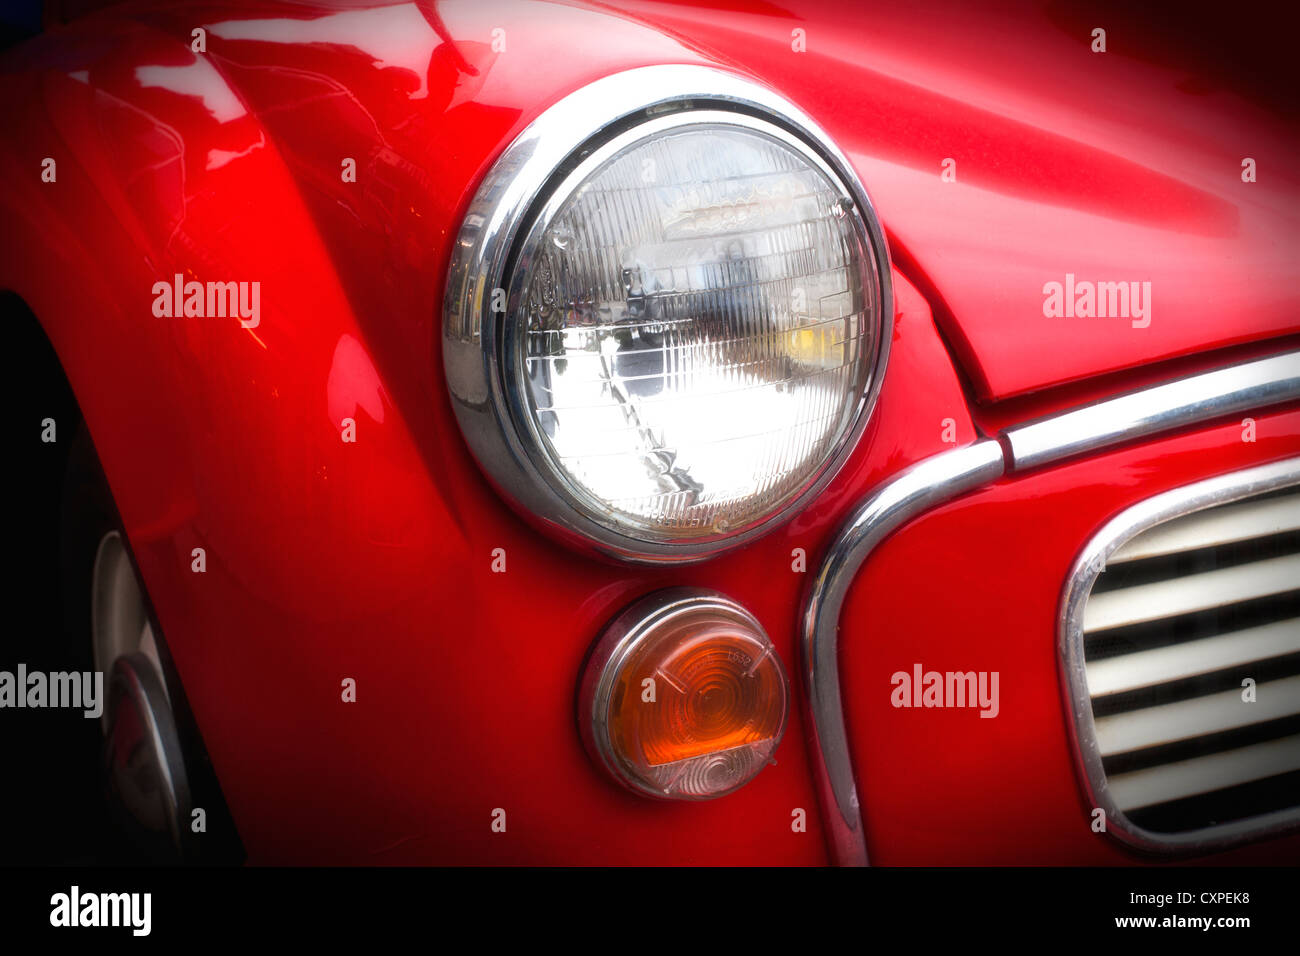 A red Morris Traveller van in Gloucestershire, UK Stock Photo